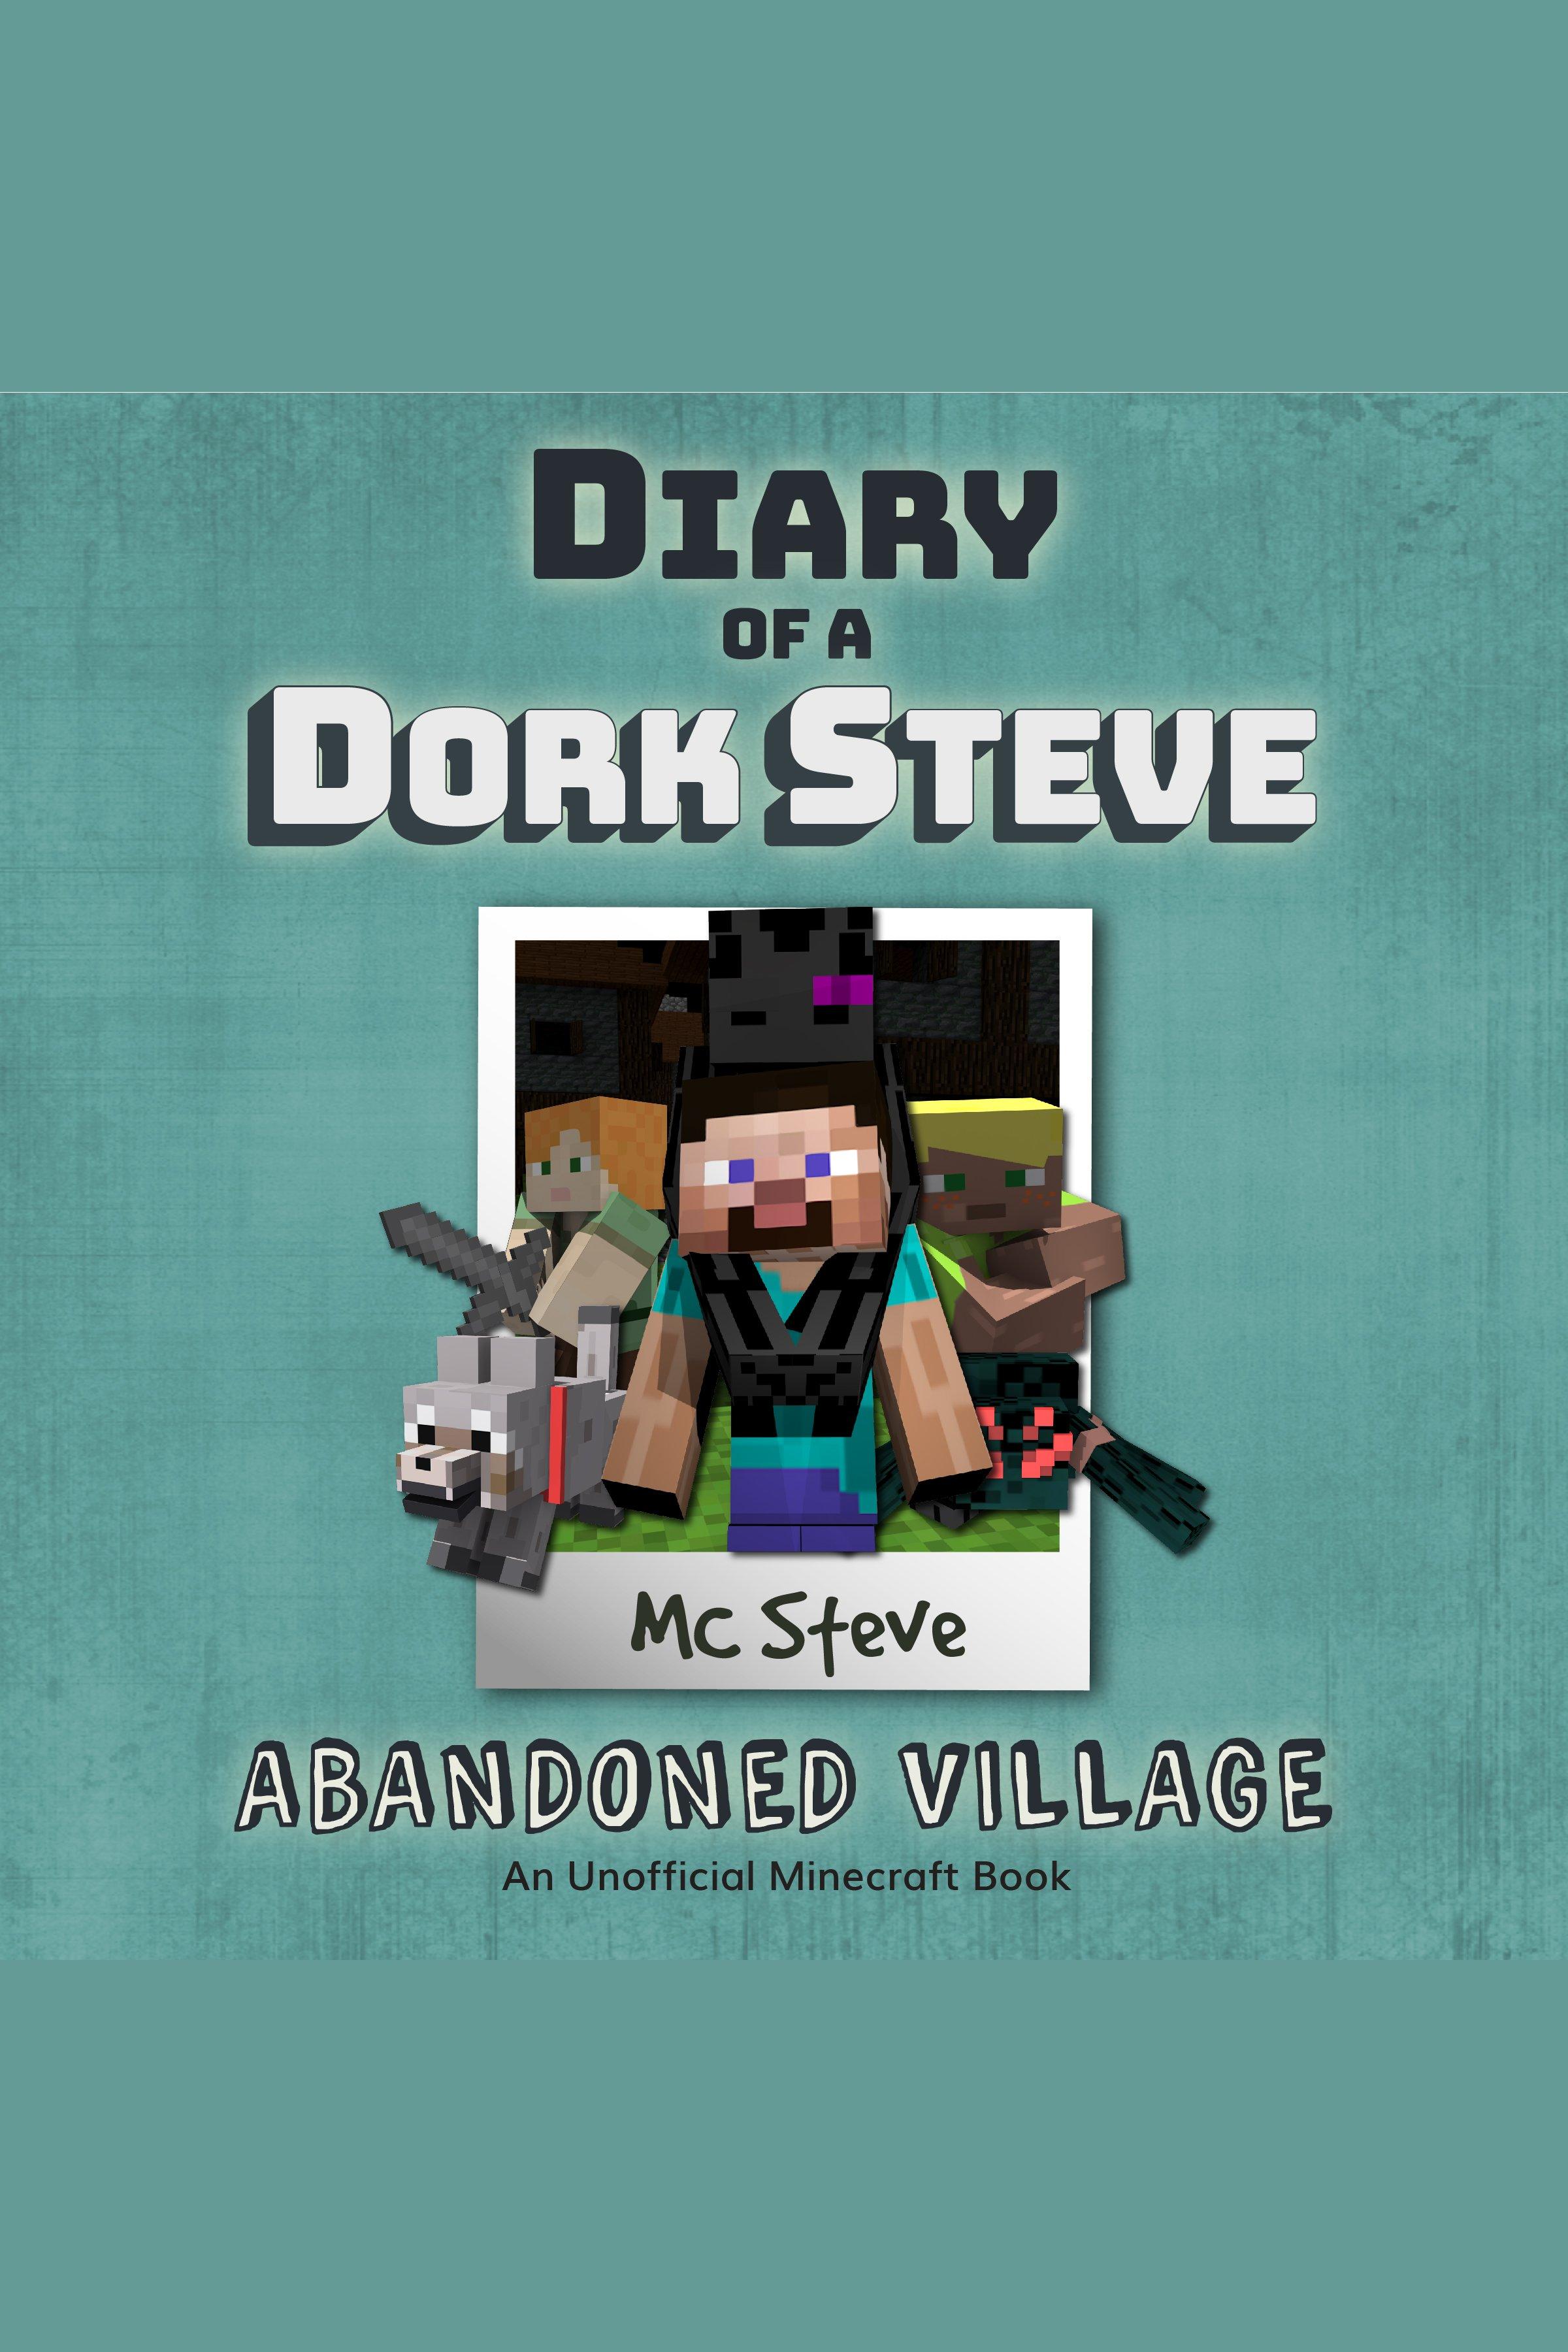 Diary Of A Minecraft Dork Steve Book 3: Abandoned Village (An Unofficial Minecraft Book)